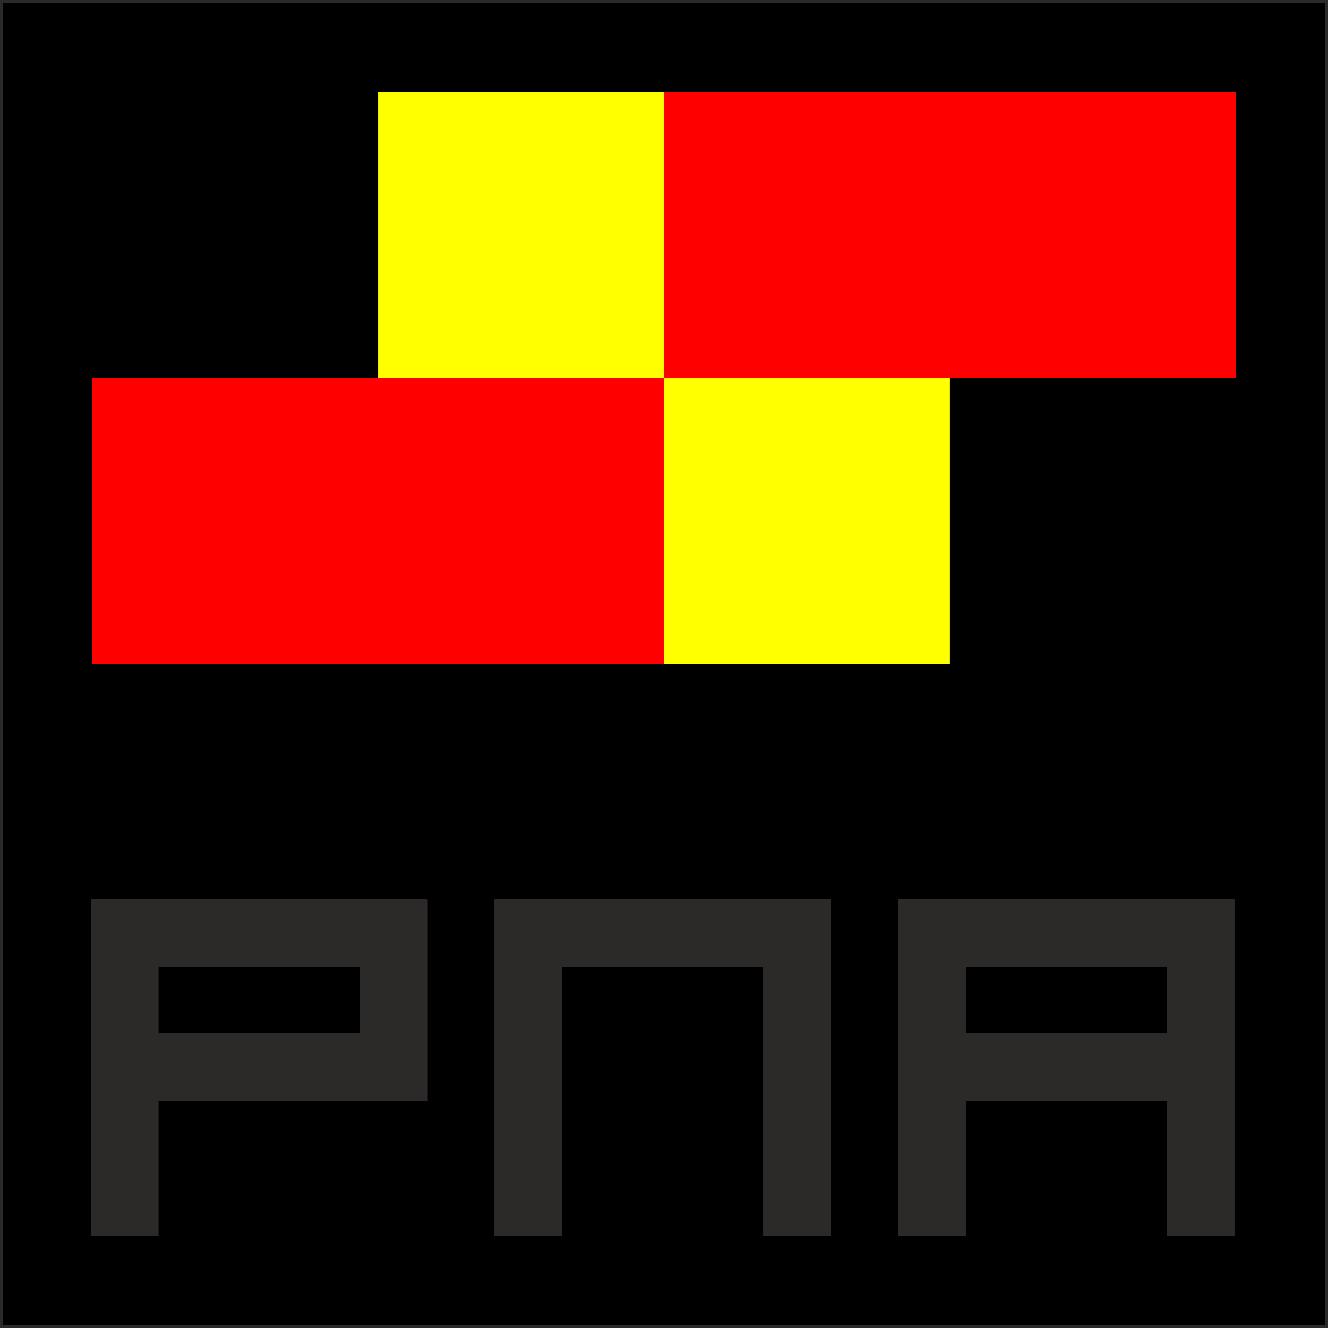 PREMIO NACIONAL ARQUITECNIA